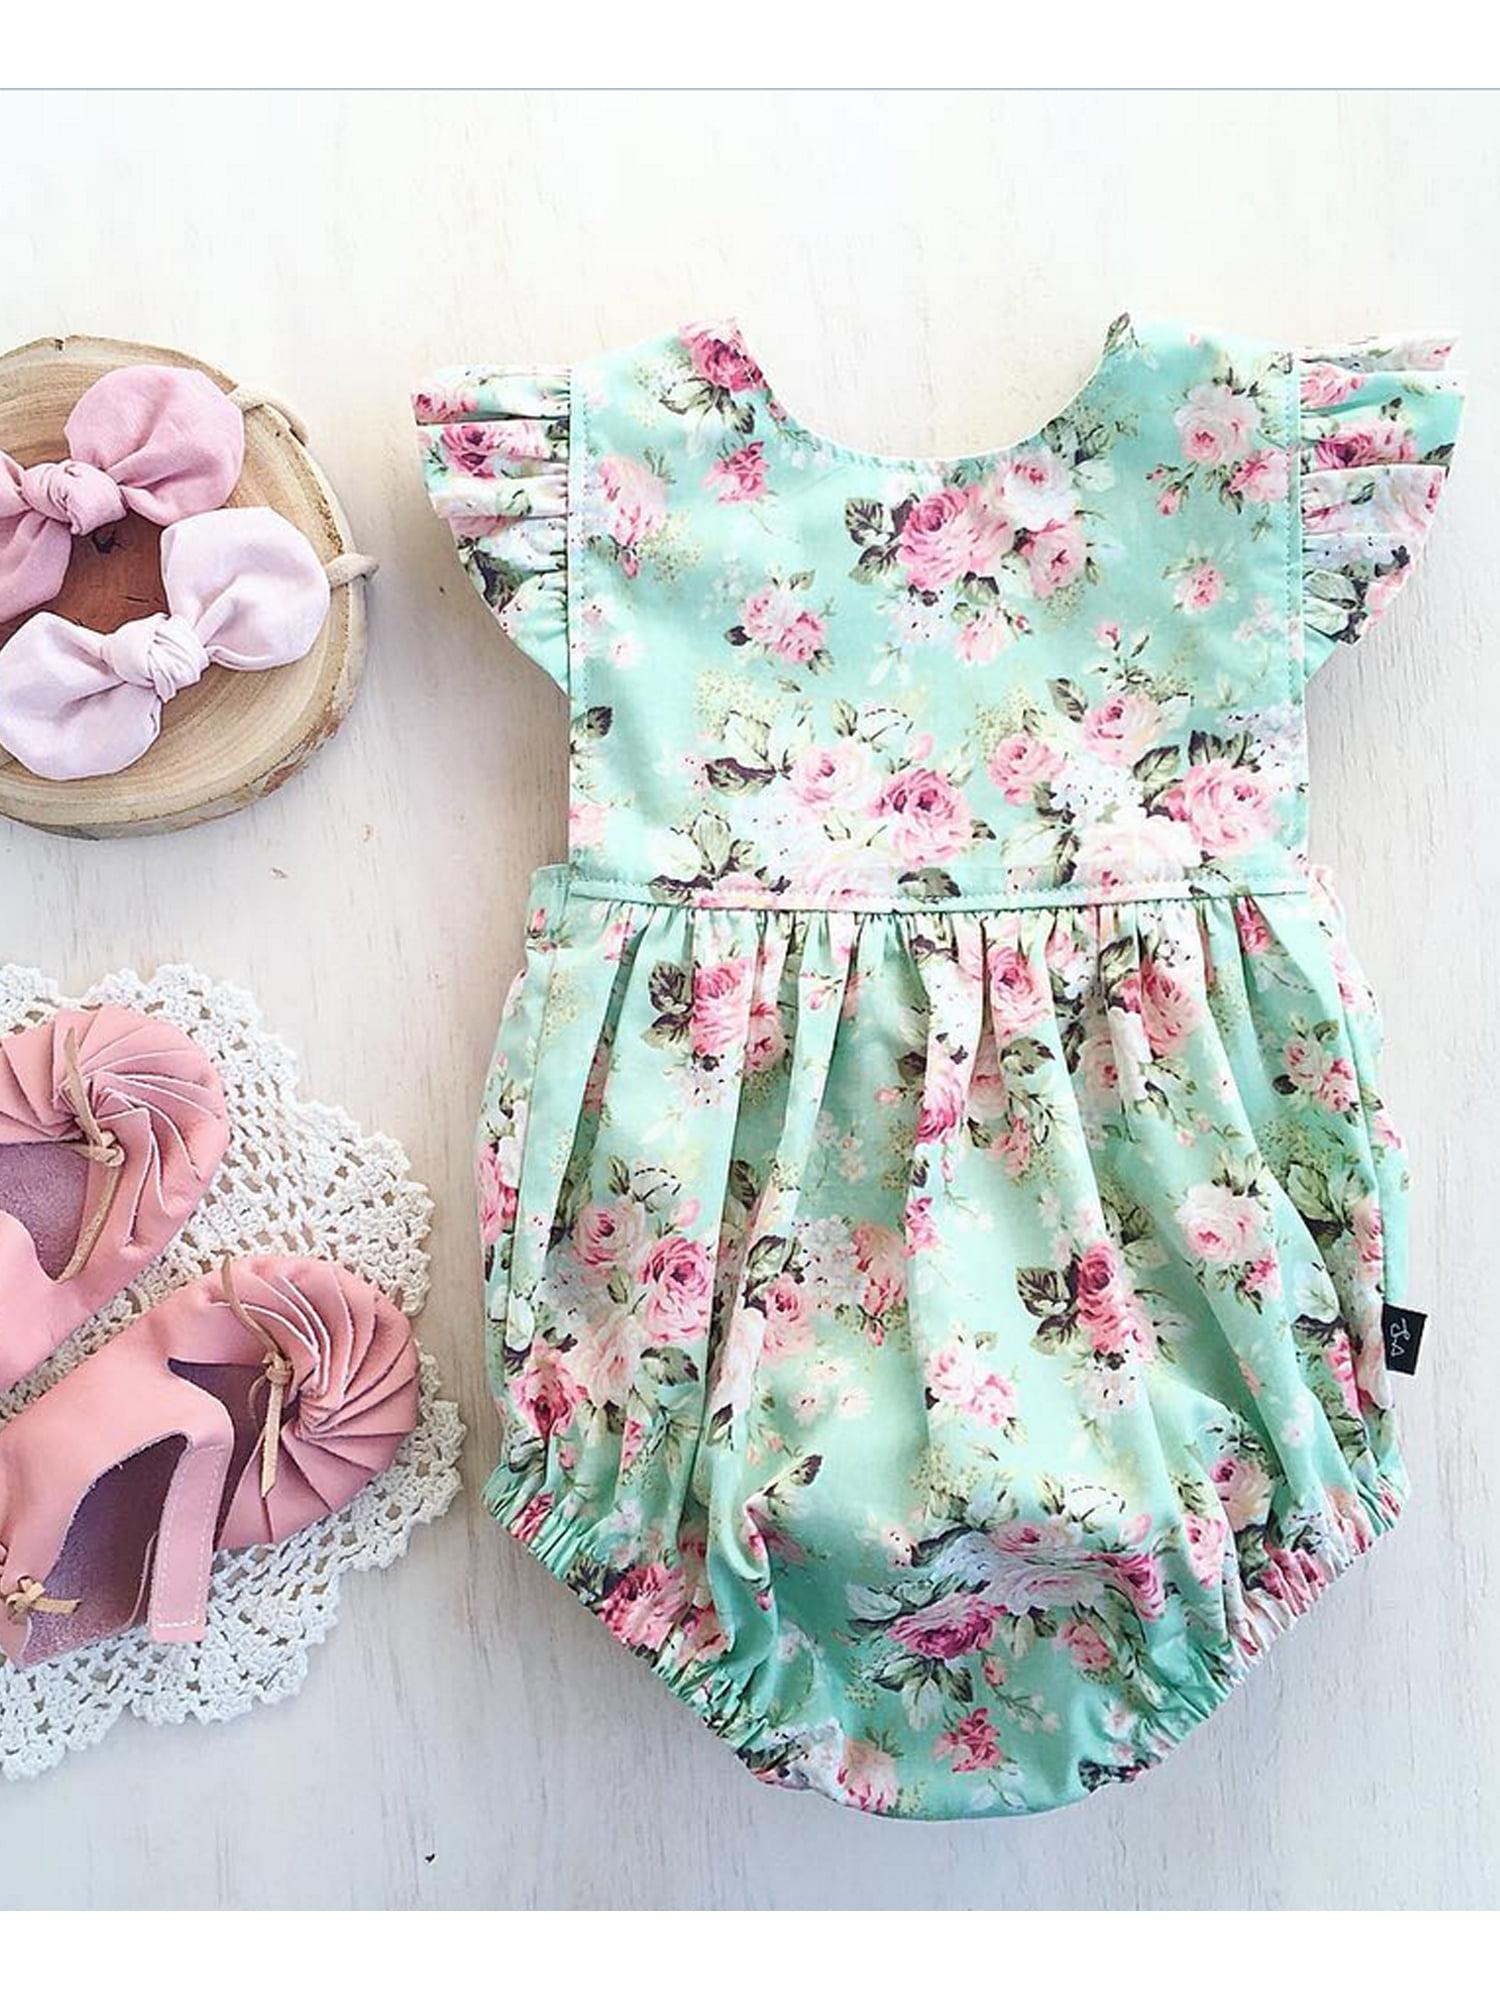 Newborn Baby Girl Summer Flower Romper Bodysuit Jumpsuit Outfits Clothes Sunsuit